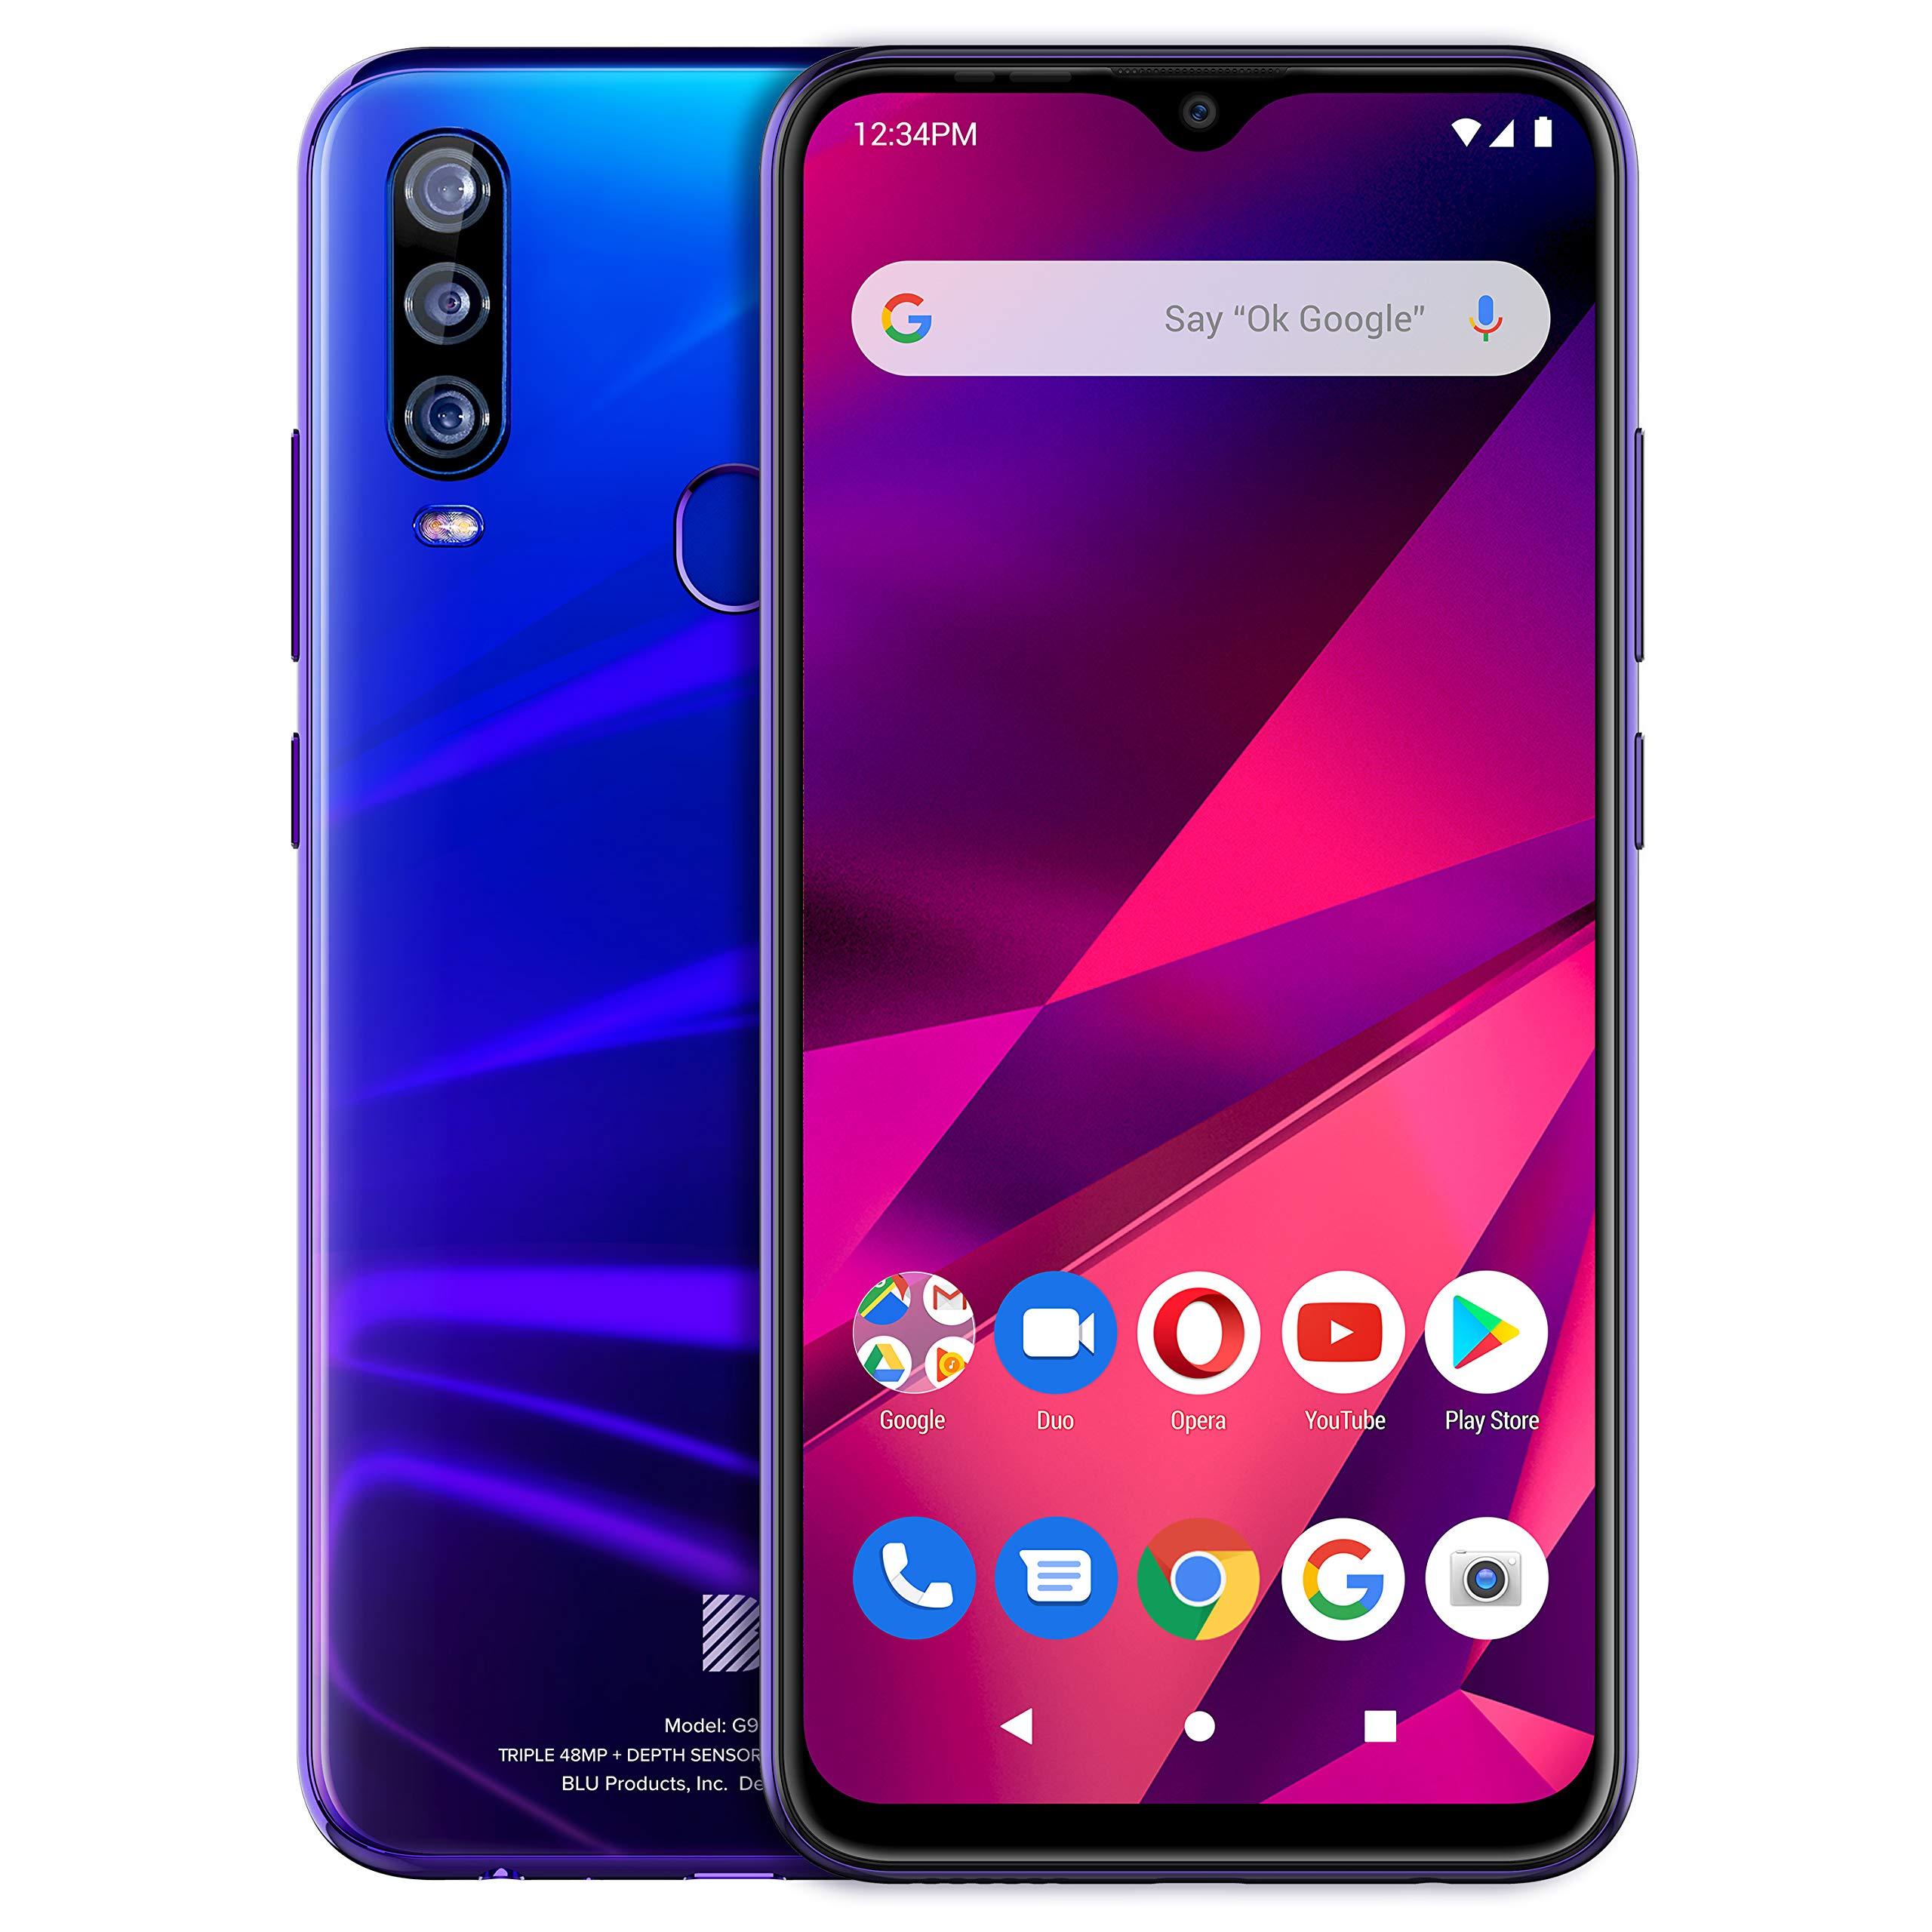 blu-g9-pro-63-full-hd-smartphone-with-triple-main-camera-128gb4gb-ram-nightfall